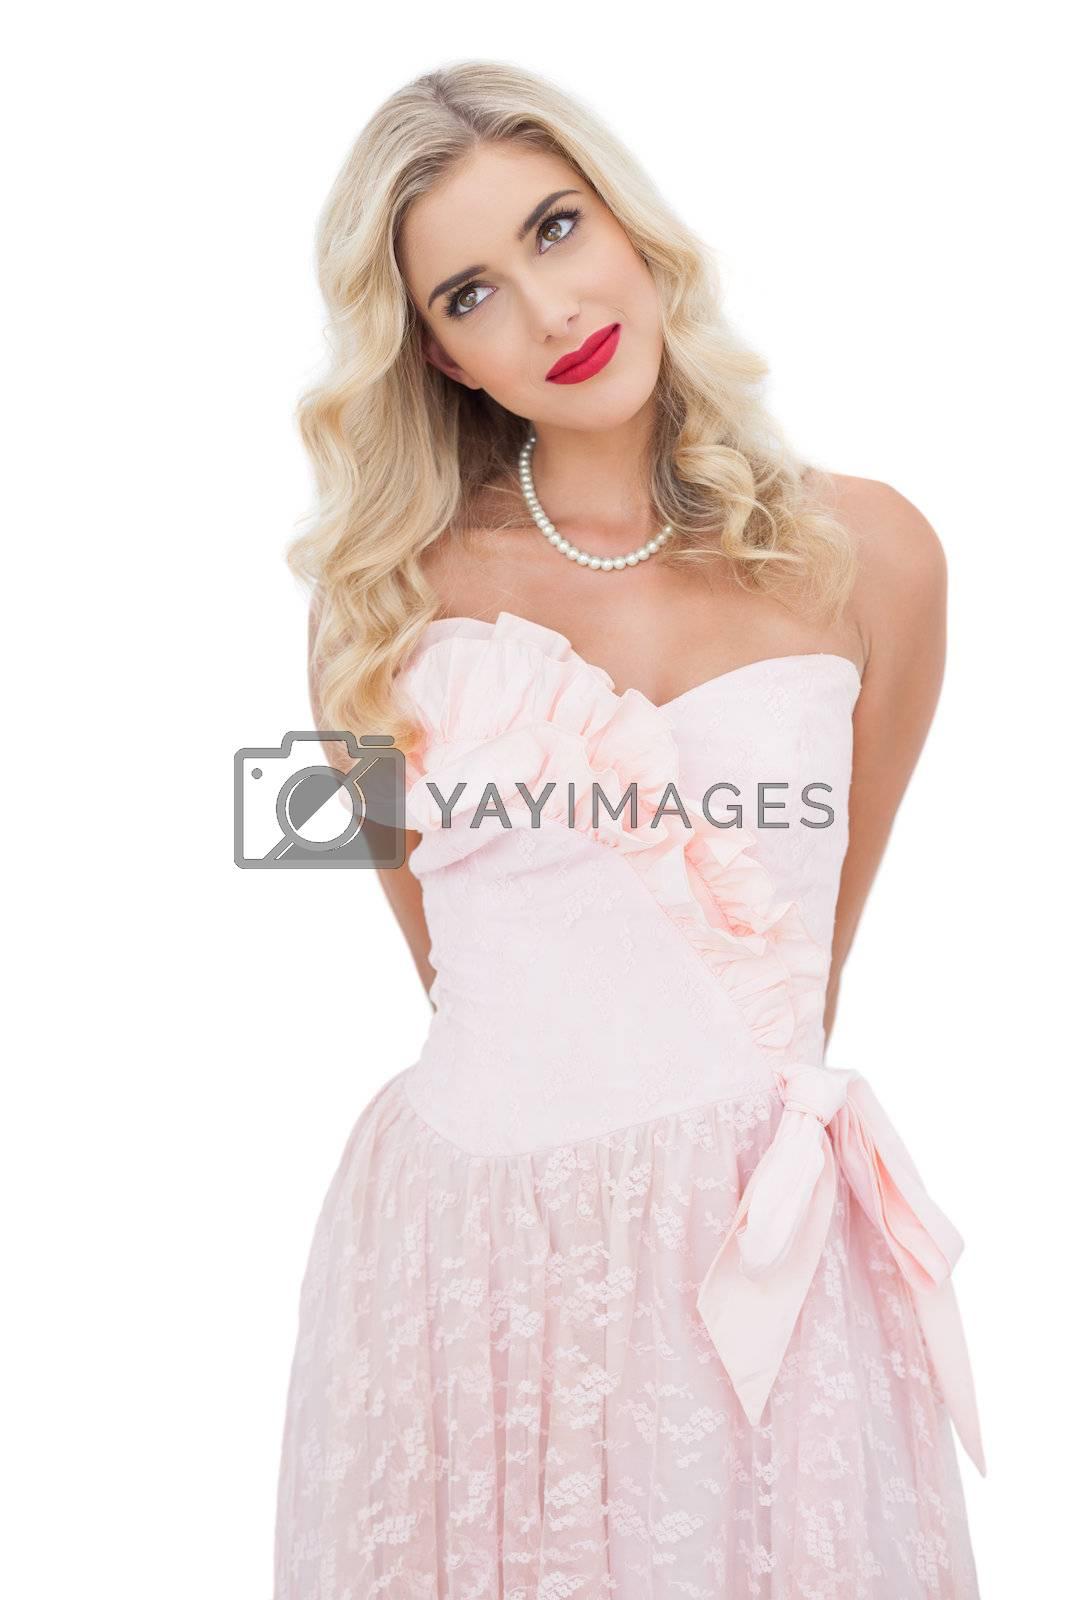 Content blonde model in pink dress posing looking away by Wavebreakmedia